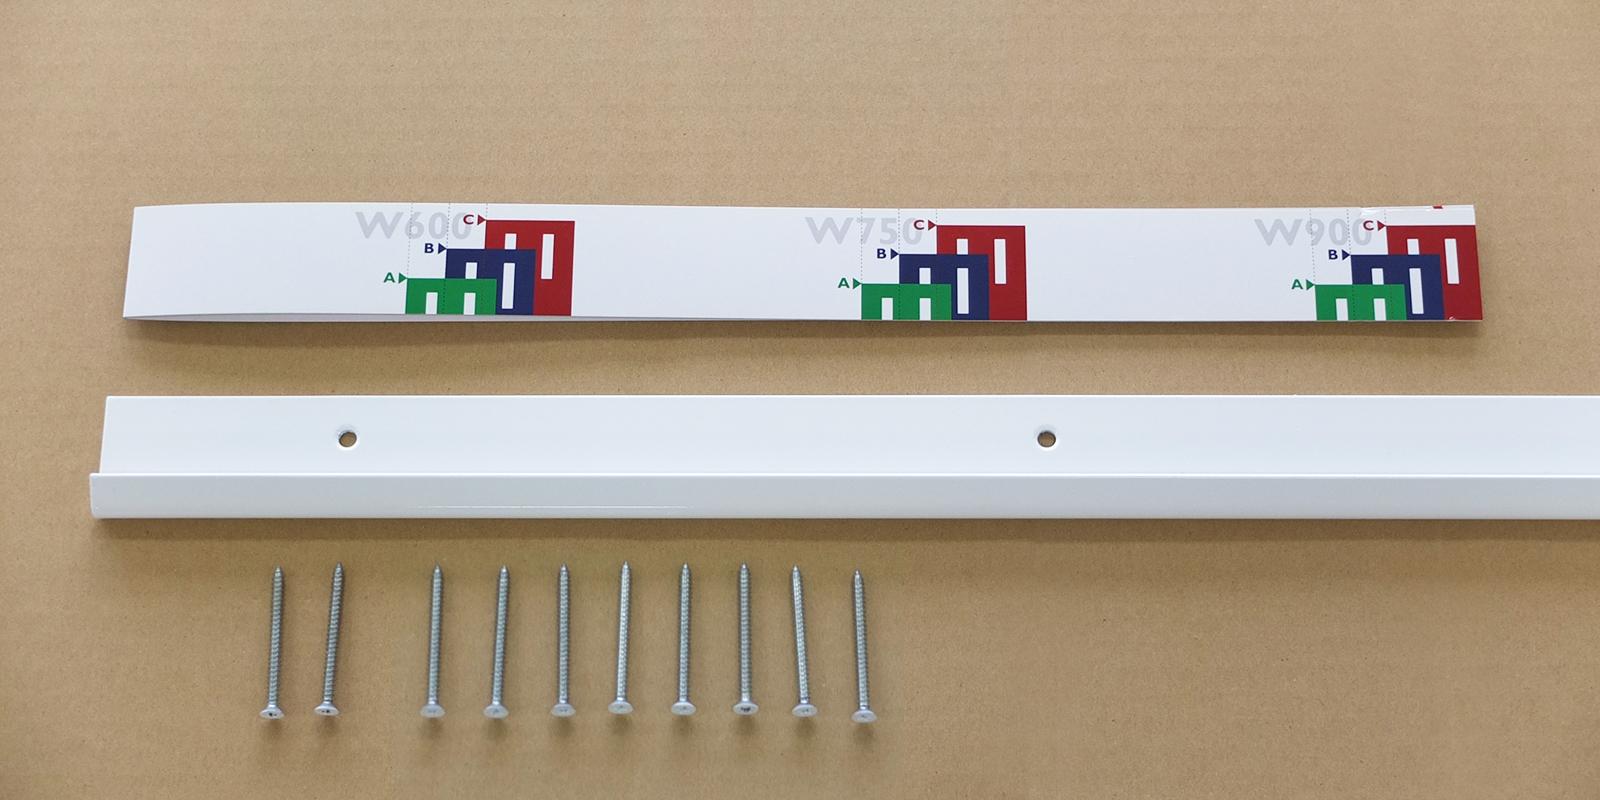 レールSA-ESR1800 W1800(1815) ES-raku 収納 DIY 簡単 整理